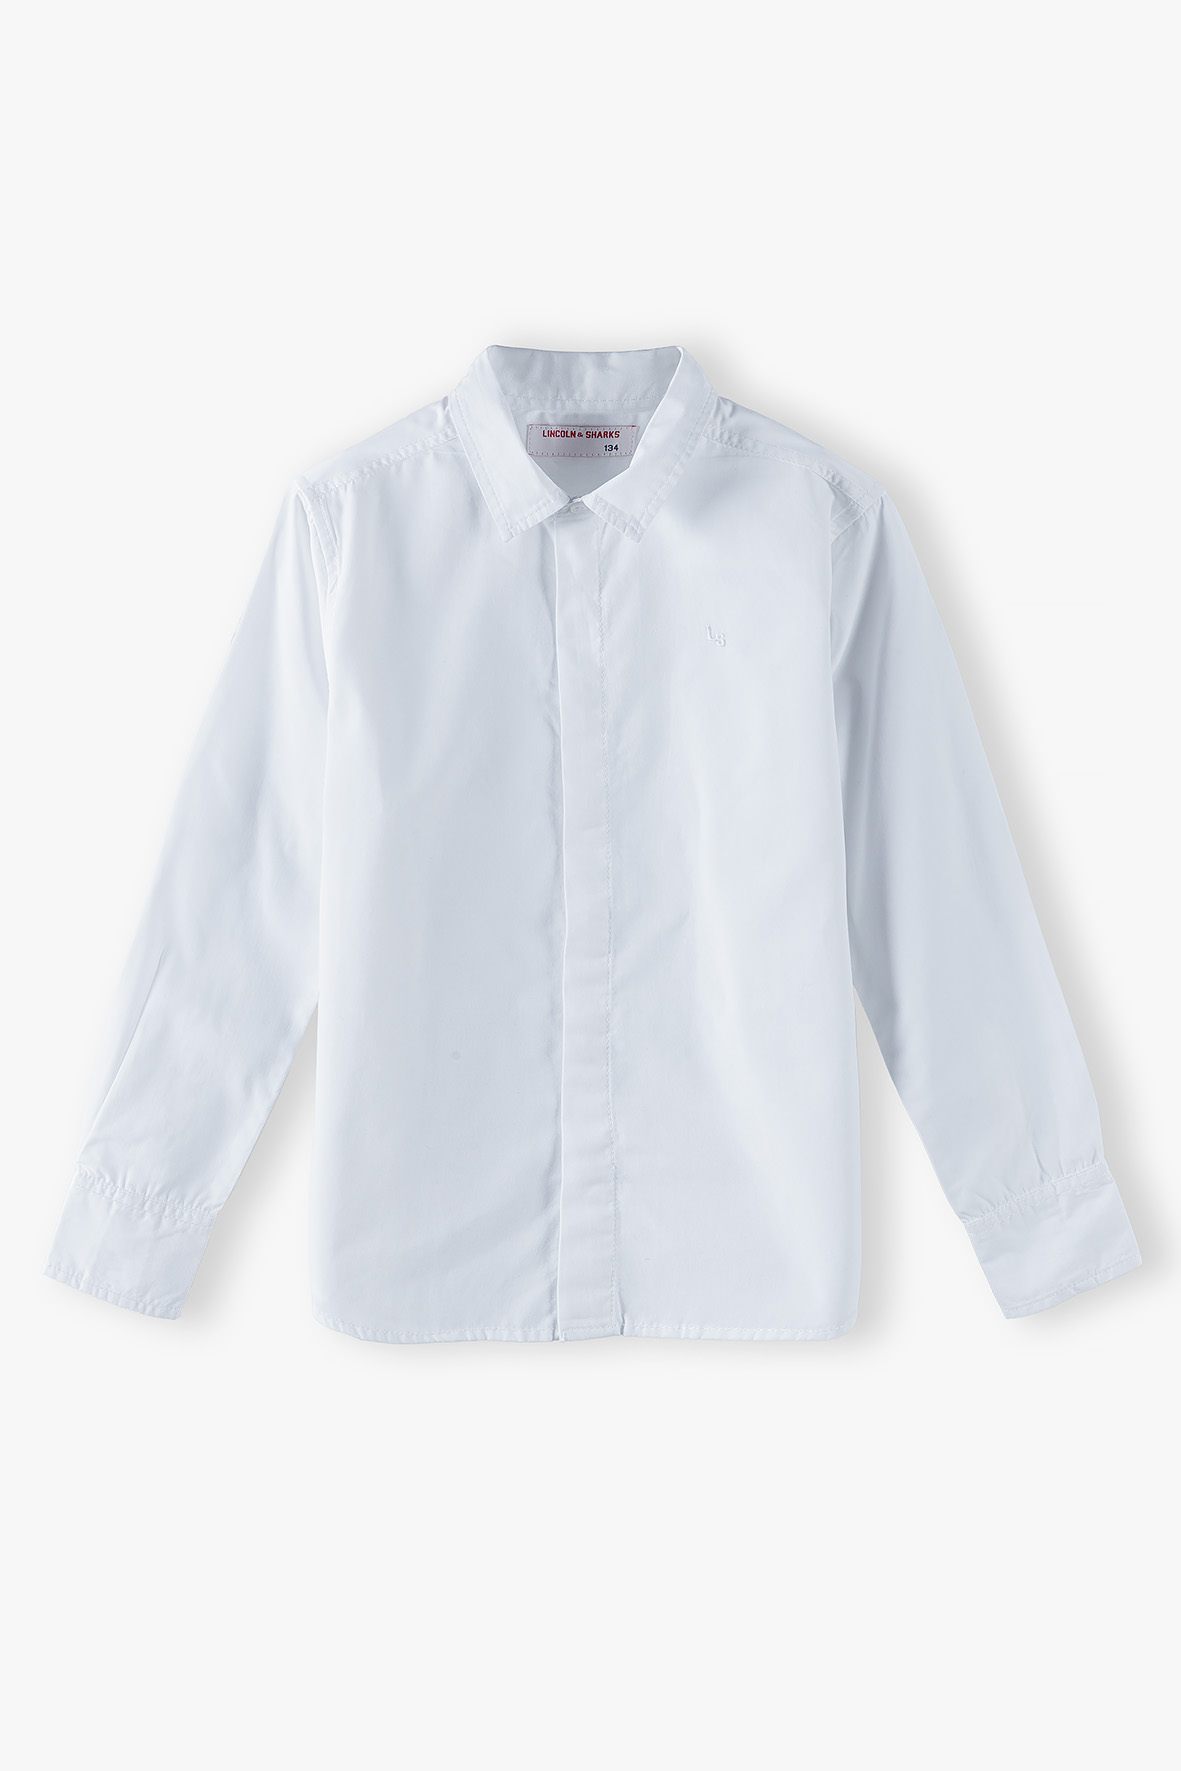 Elegancka koszula chłopięca biała 2J4002